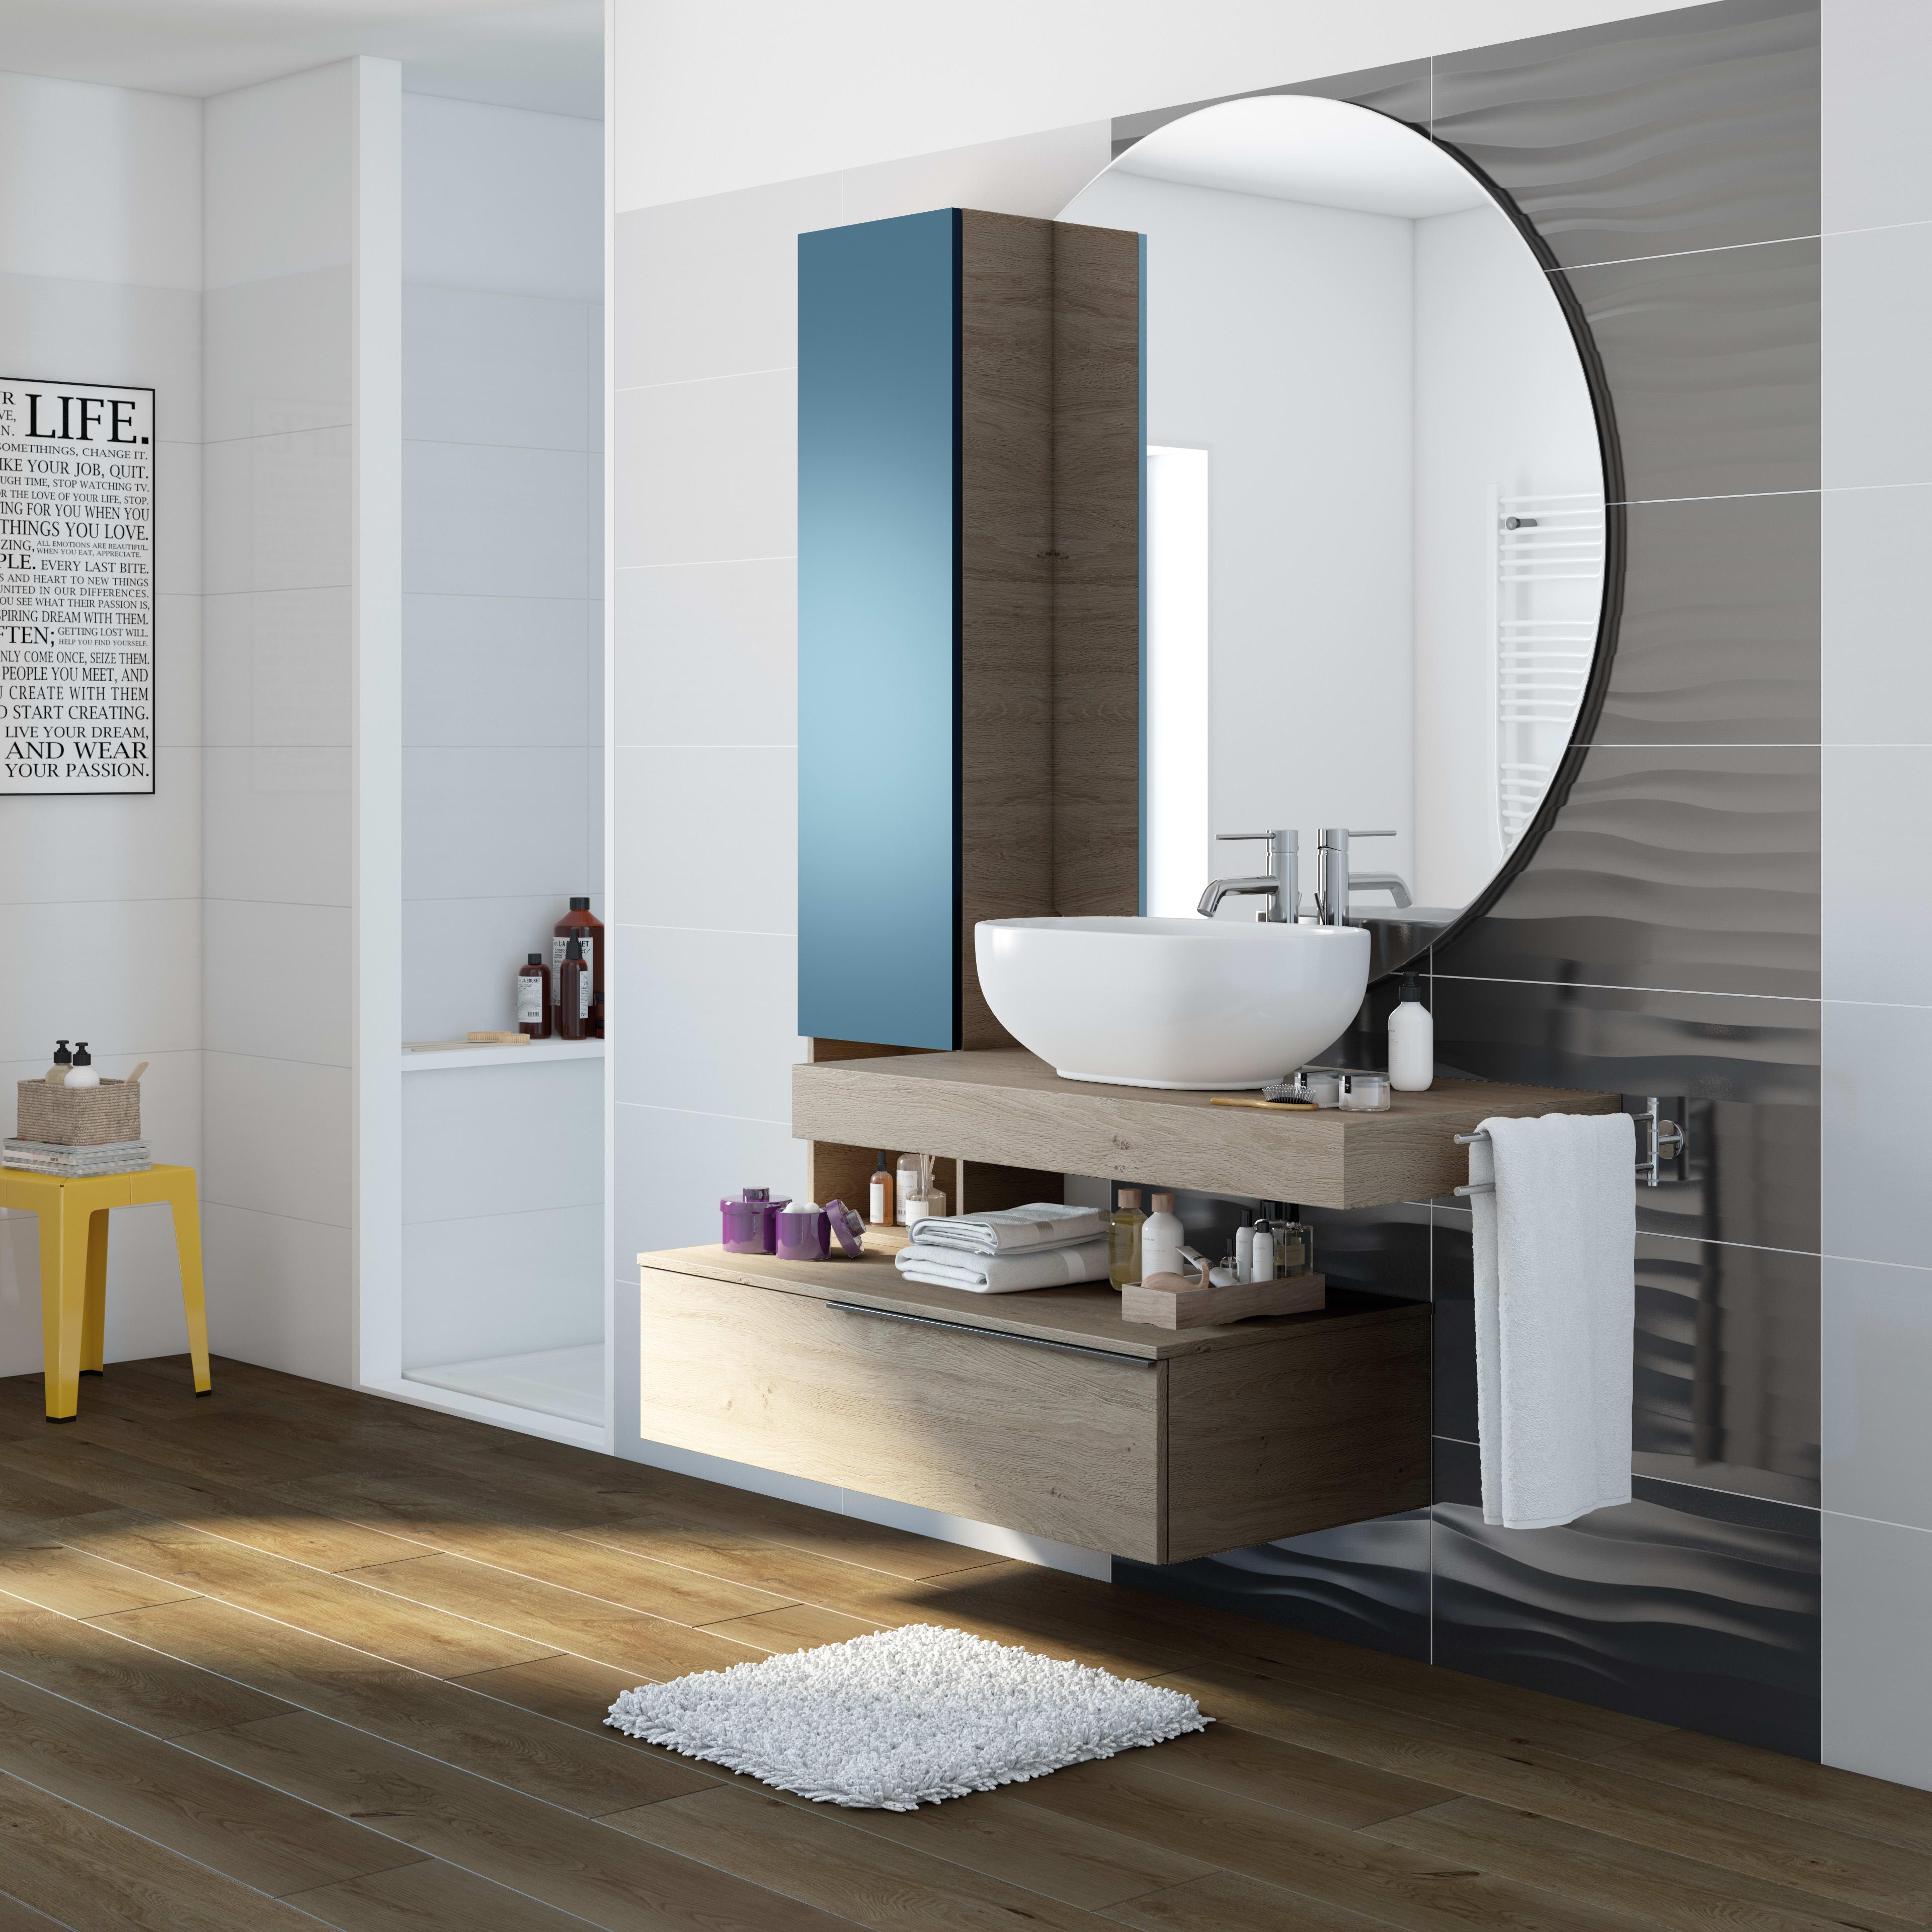 mobile bagno eklettica olmo l 135 cm prezzi e offerte online | leroy